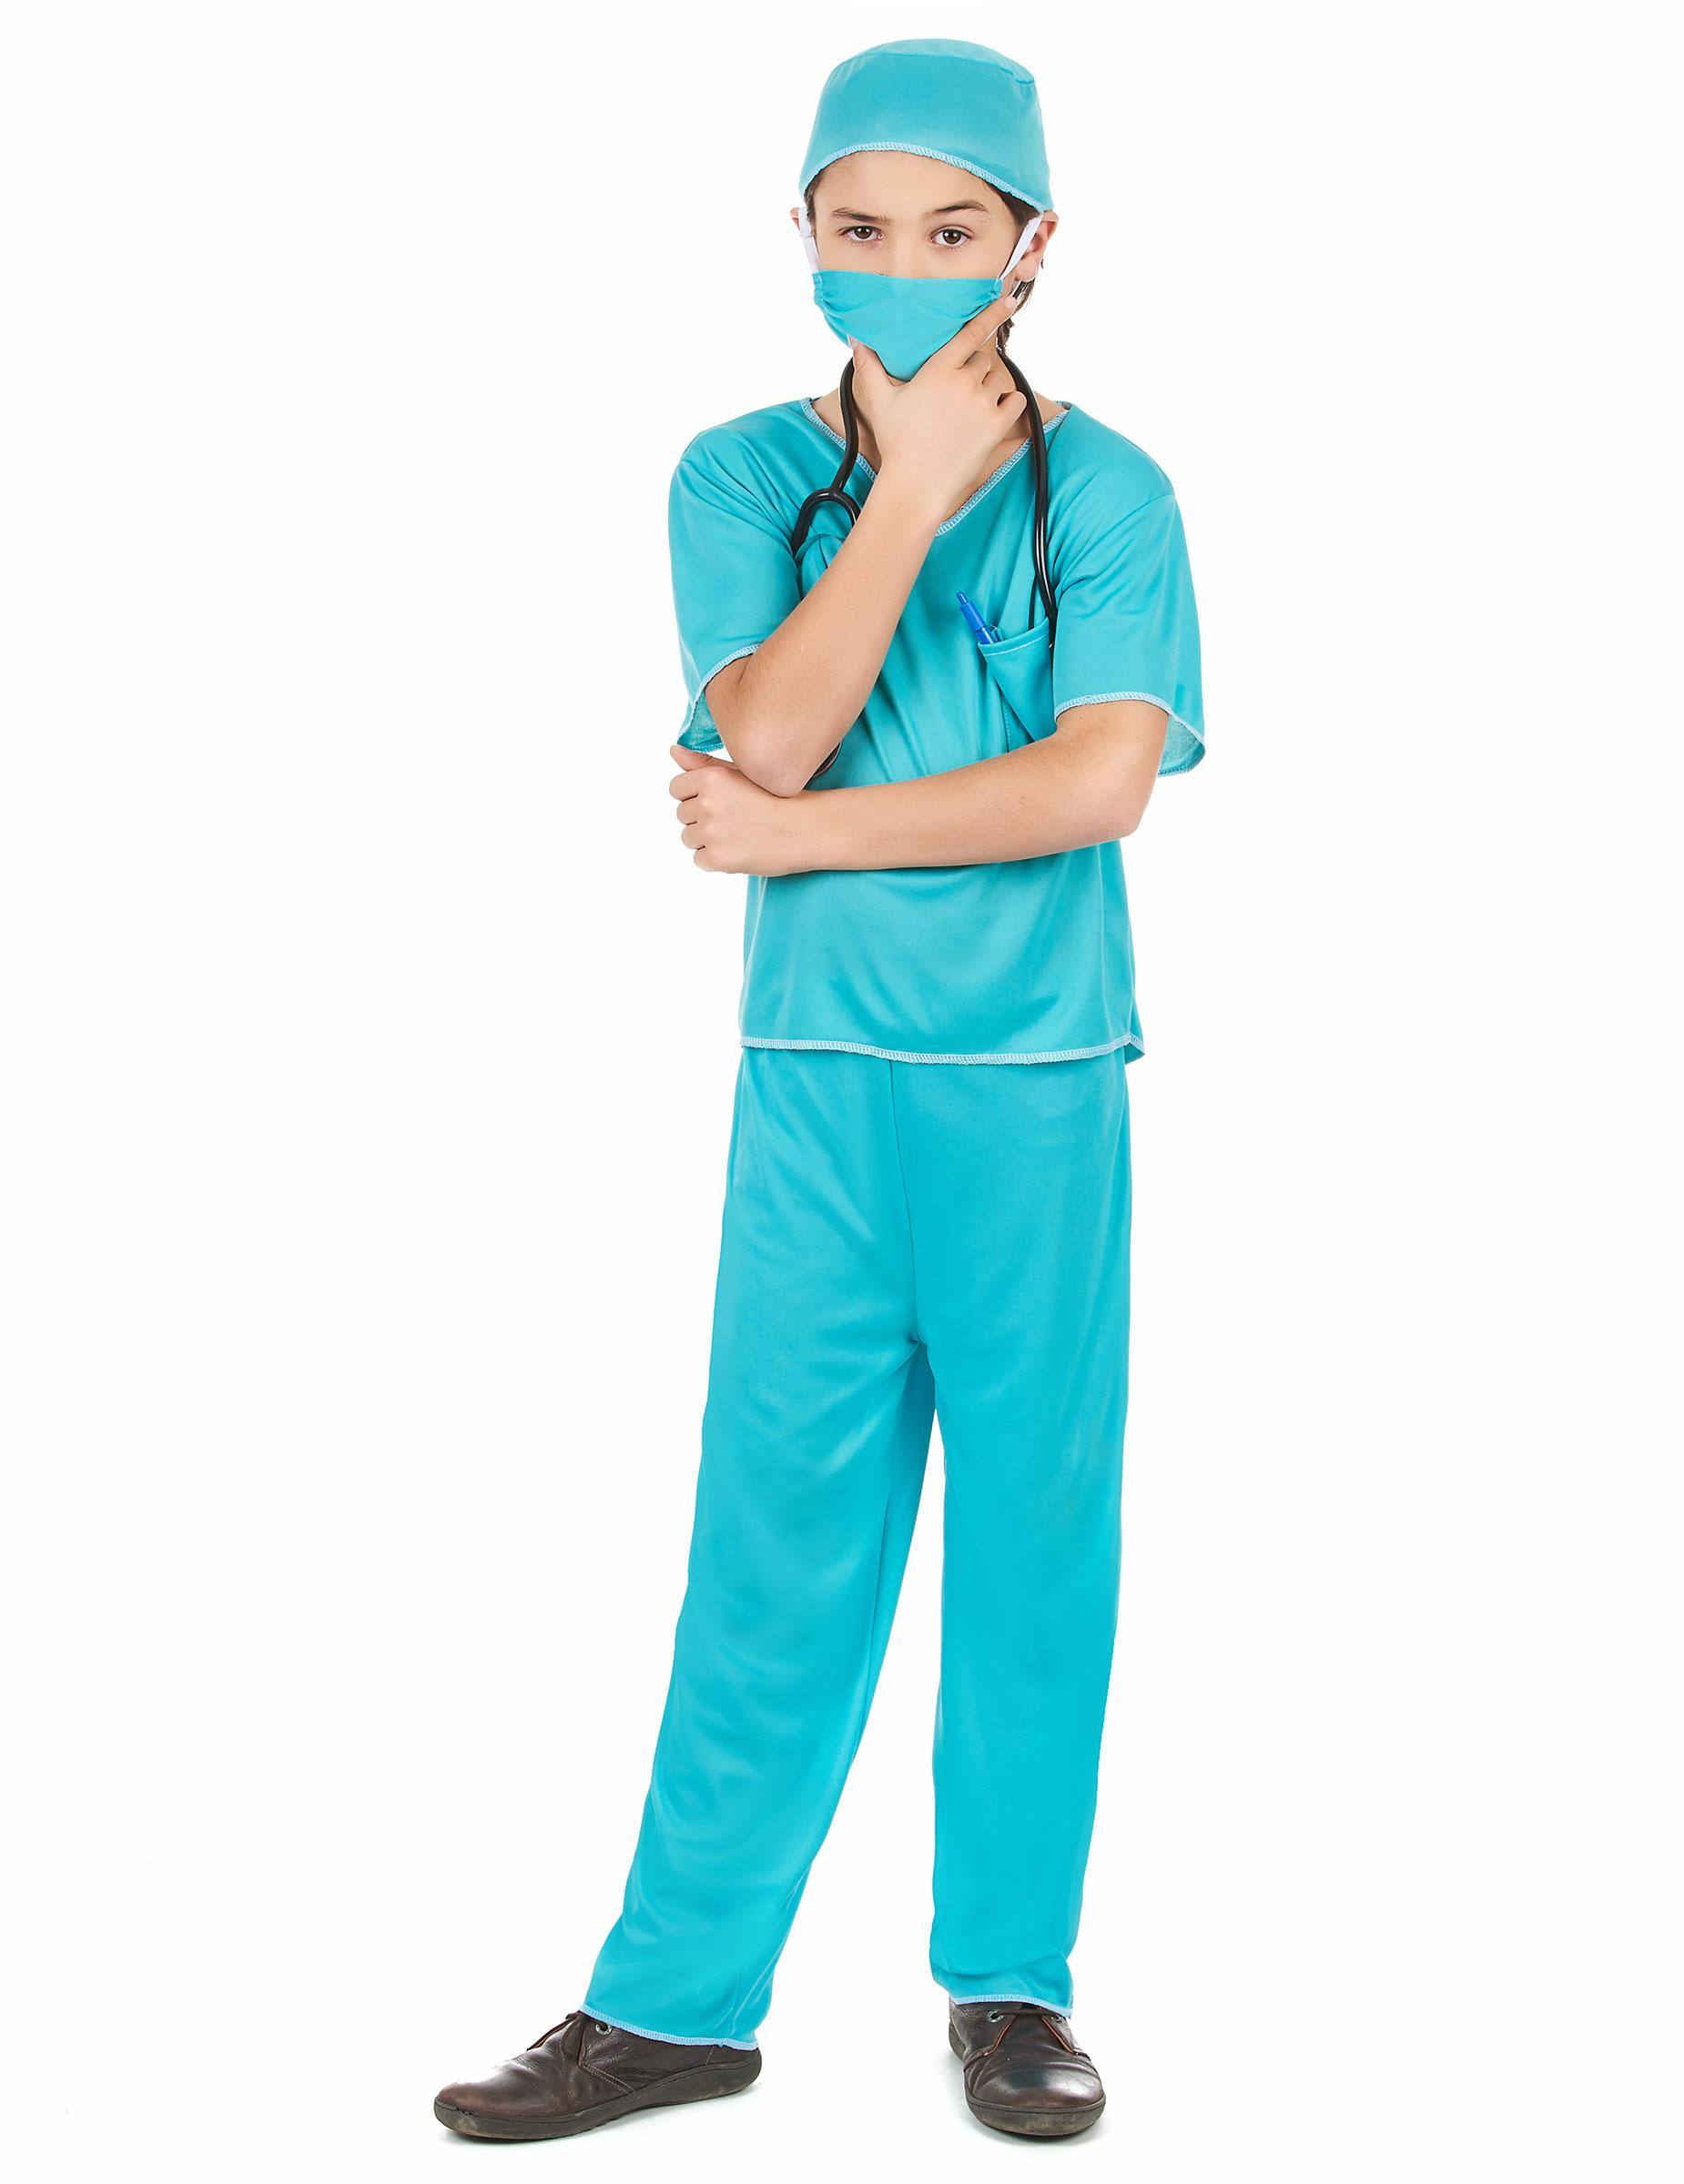 Bambini Costume da Dottore Costume Infermiera Scrubs